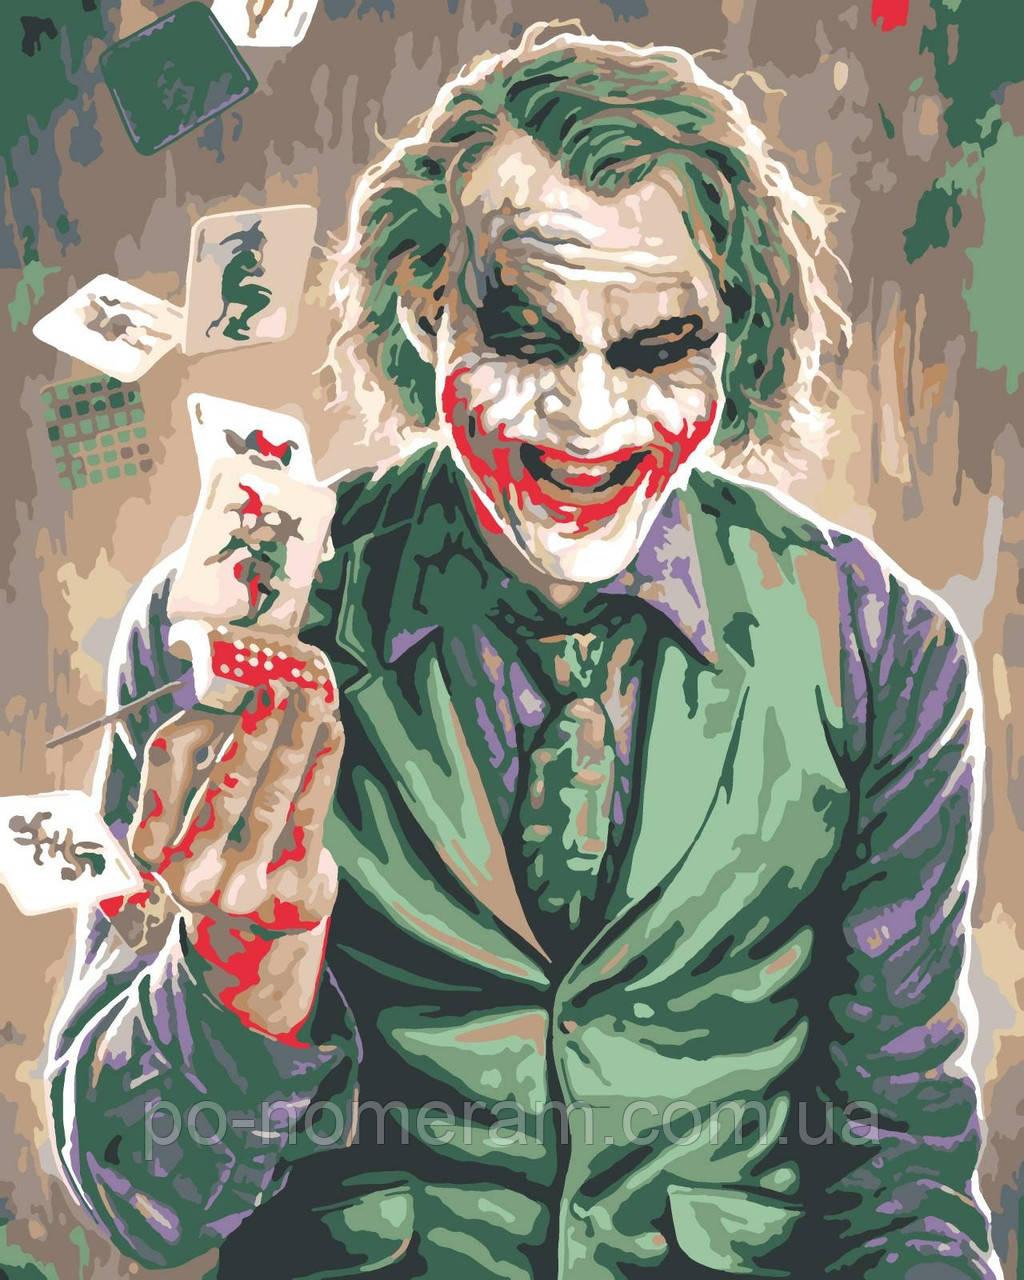 Картина по номерам Bambino Джокер (0025Л1) 40 х 50 см (Без коробки)